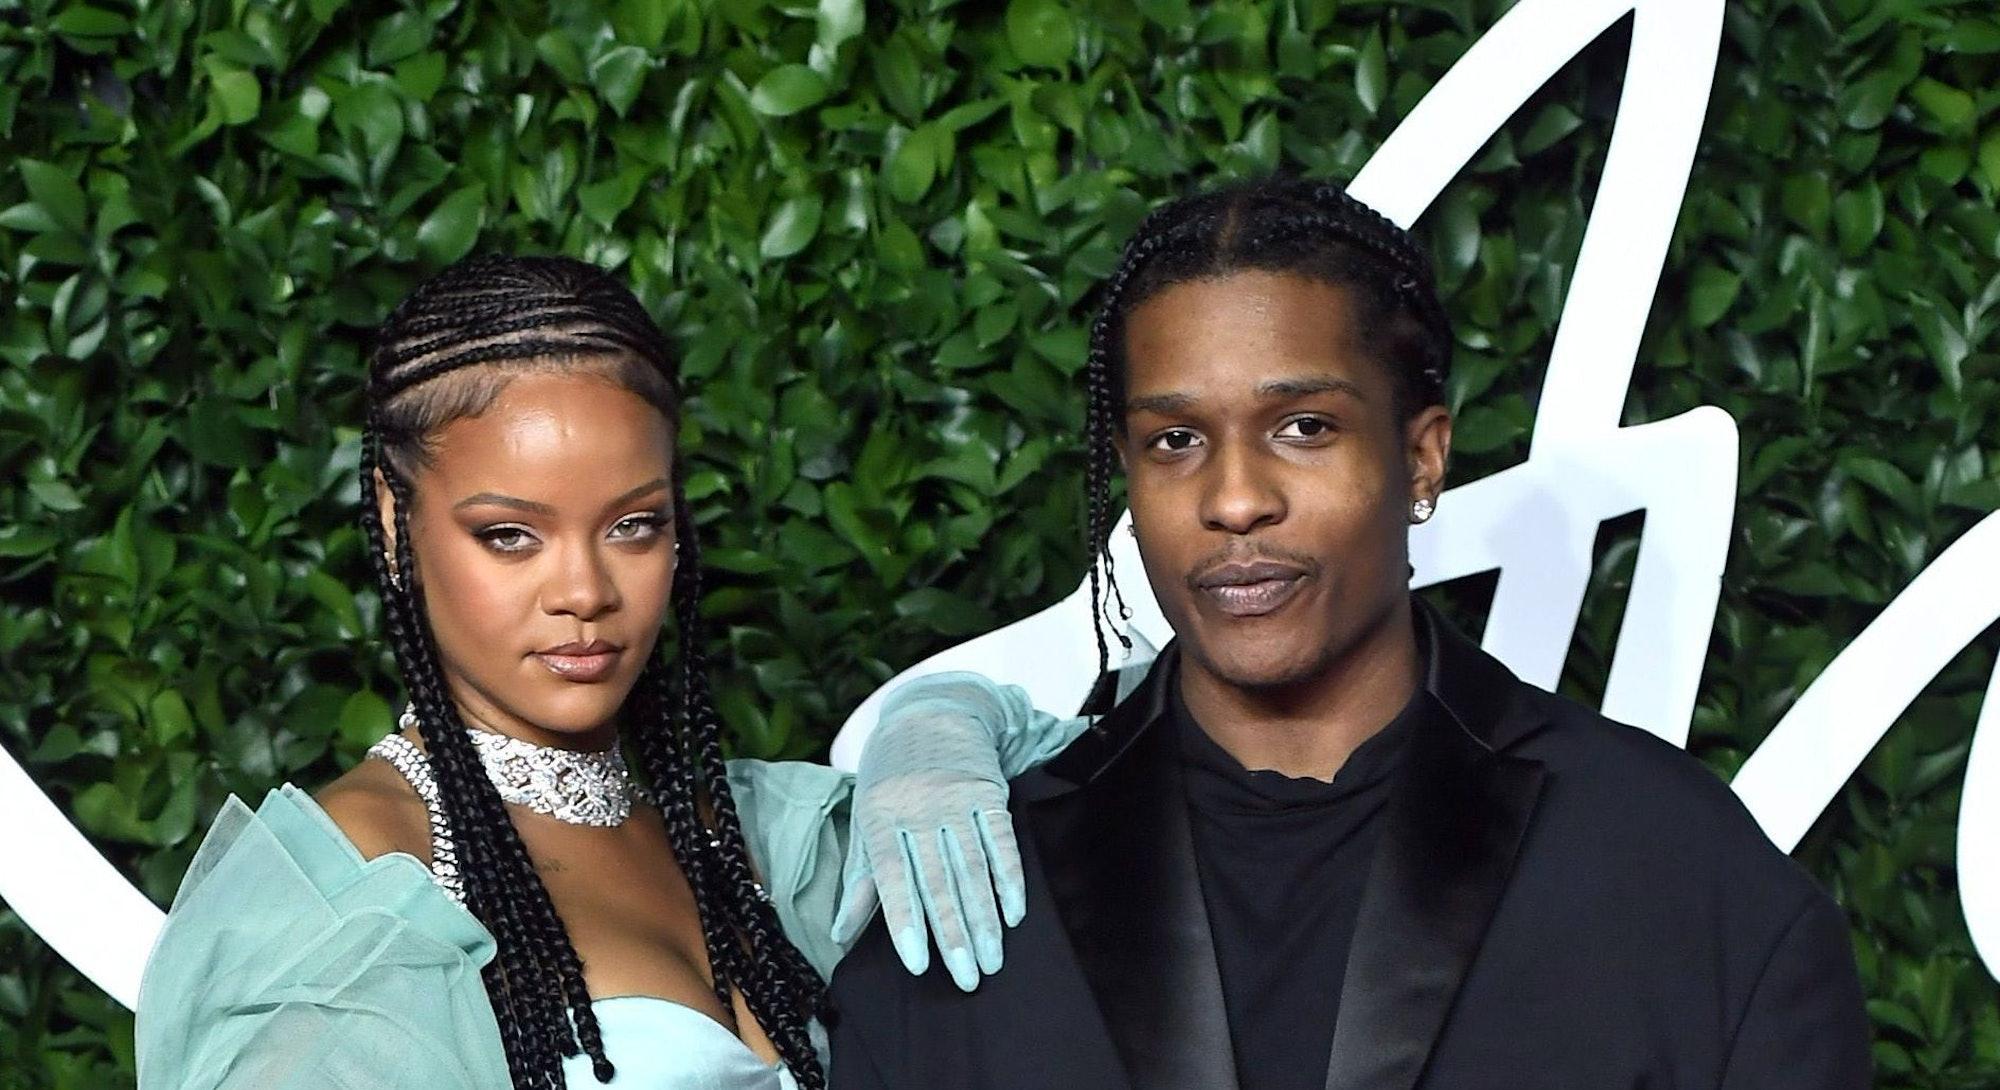 LONDON, ENGLAND - DECEMBER 02: ASAP Rocky and Rihanna arrive at The Fashion Awards 2019 held at Roya...